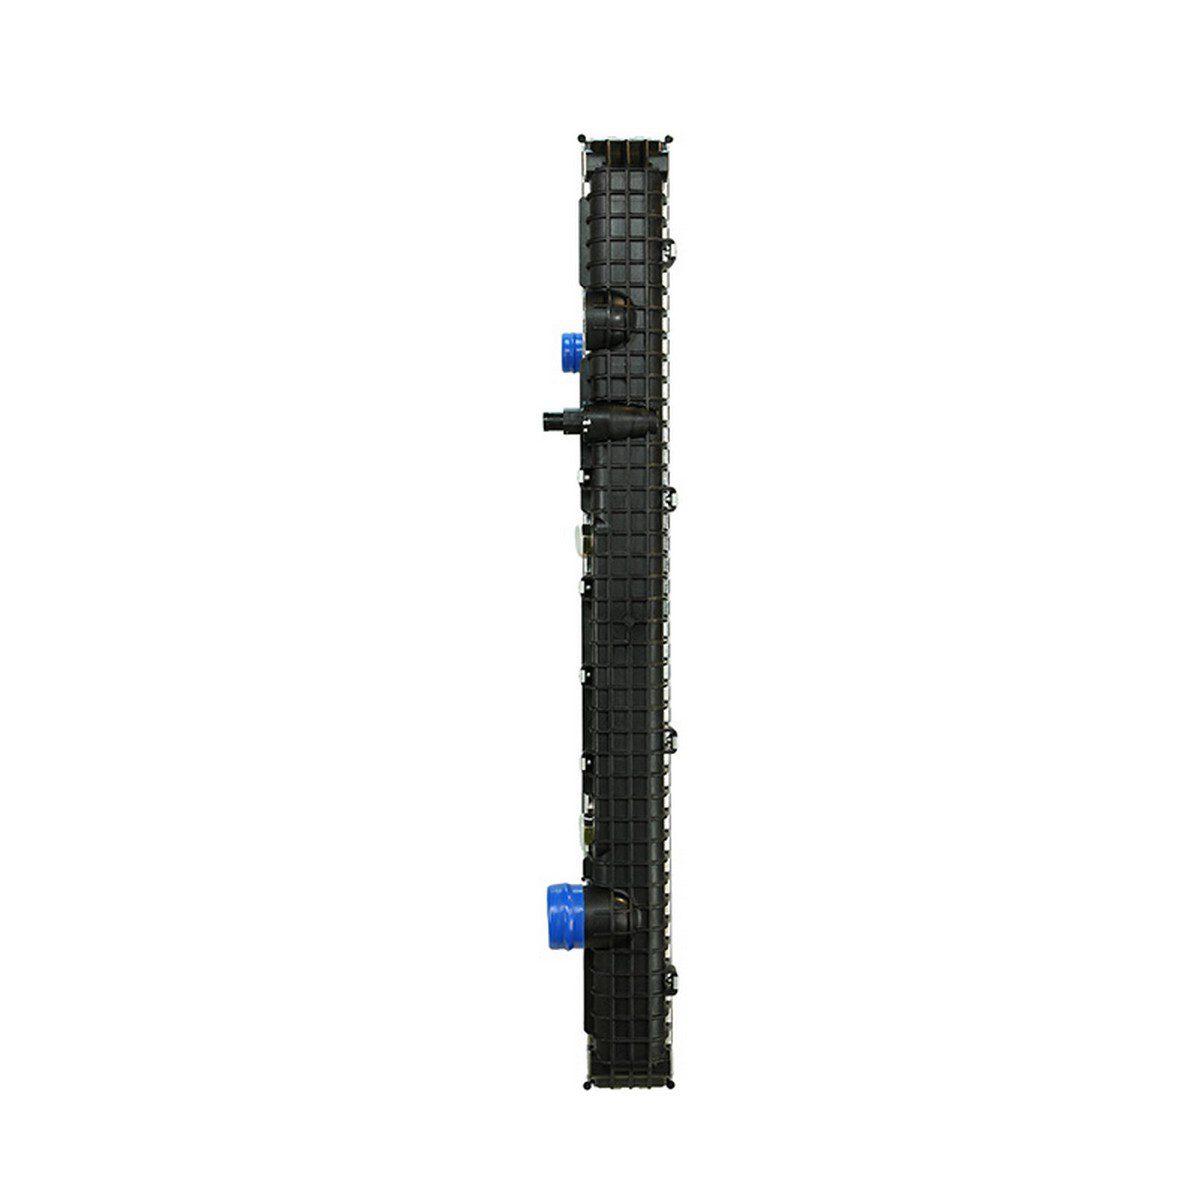 freightliner cascadia sterling 08 11 radiator oem 05 29617 009 6